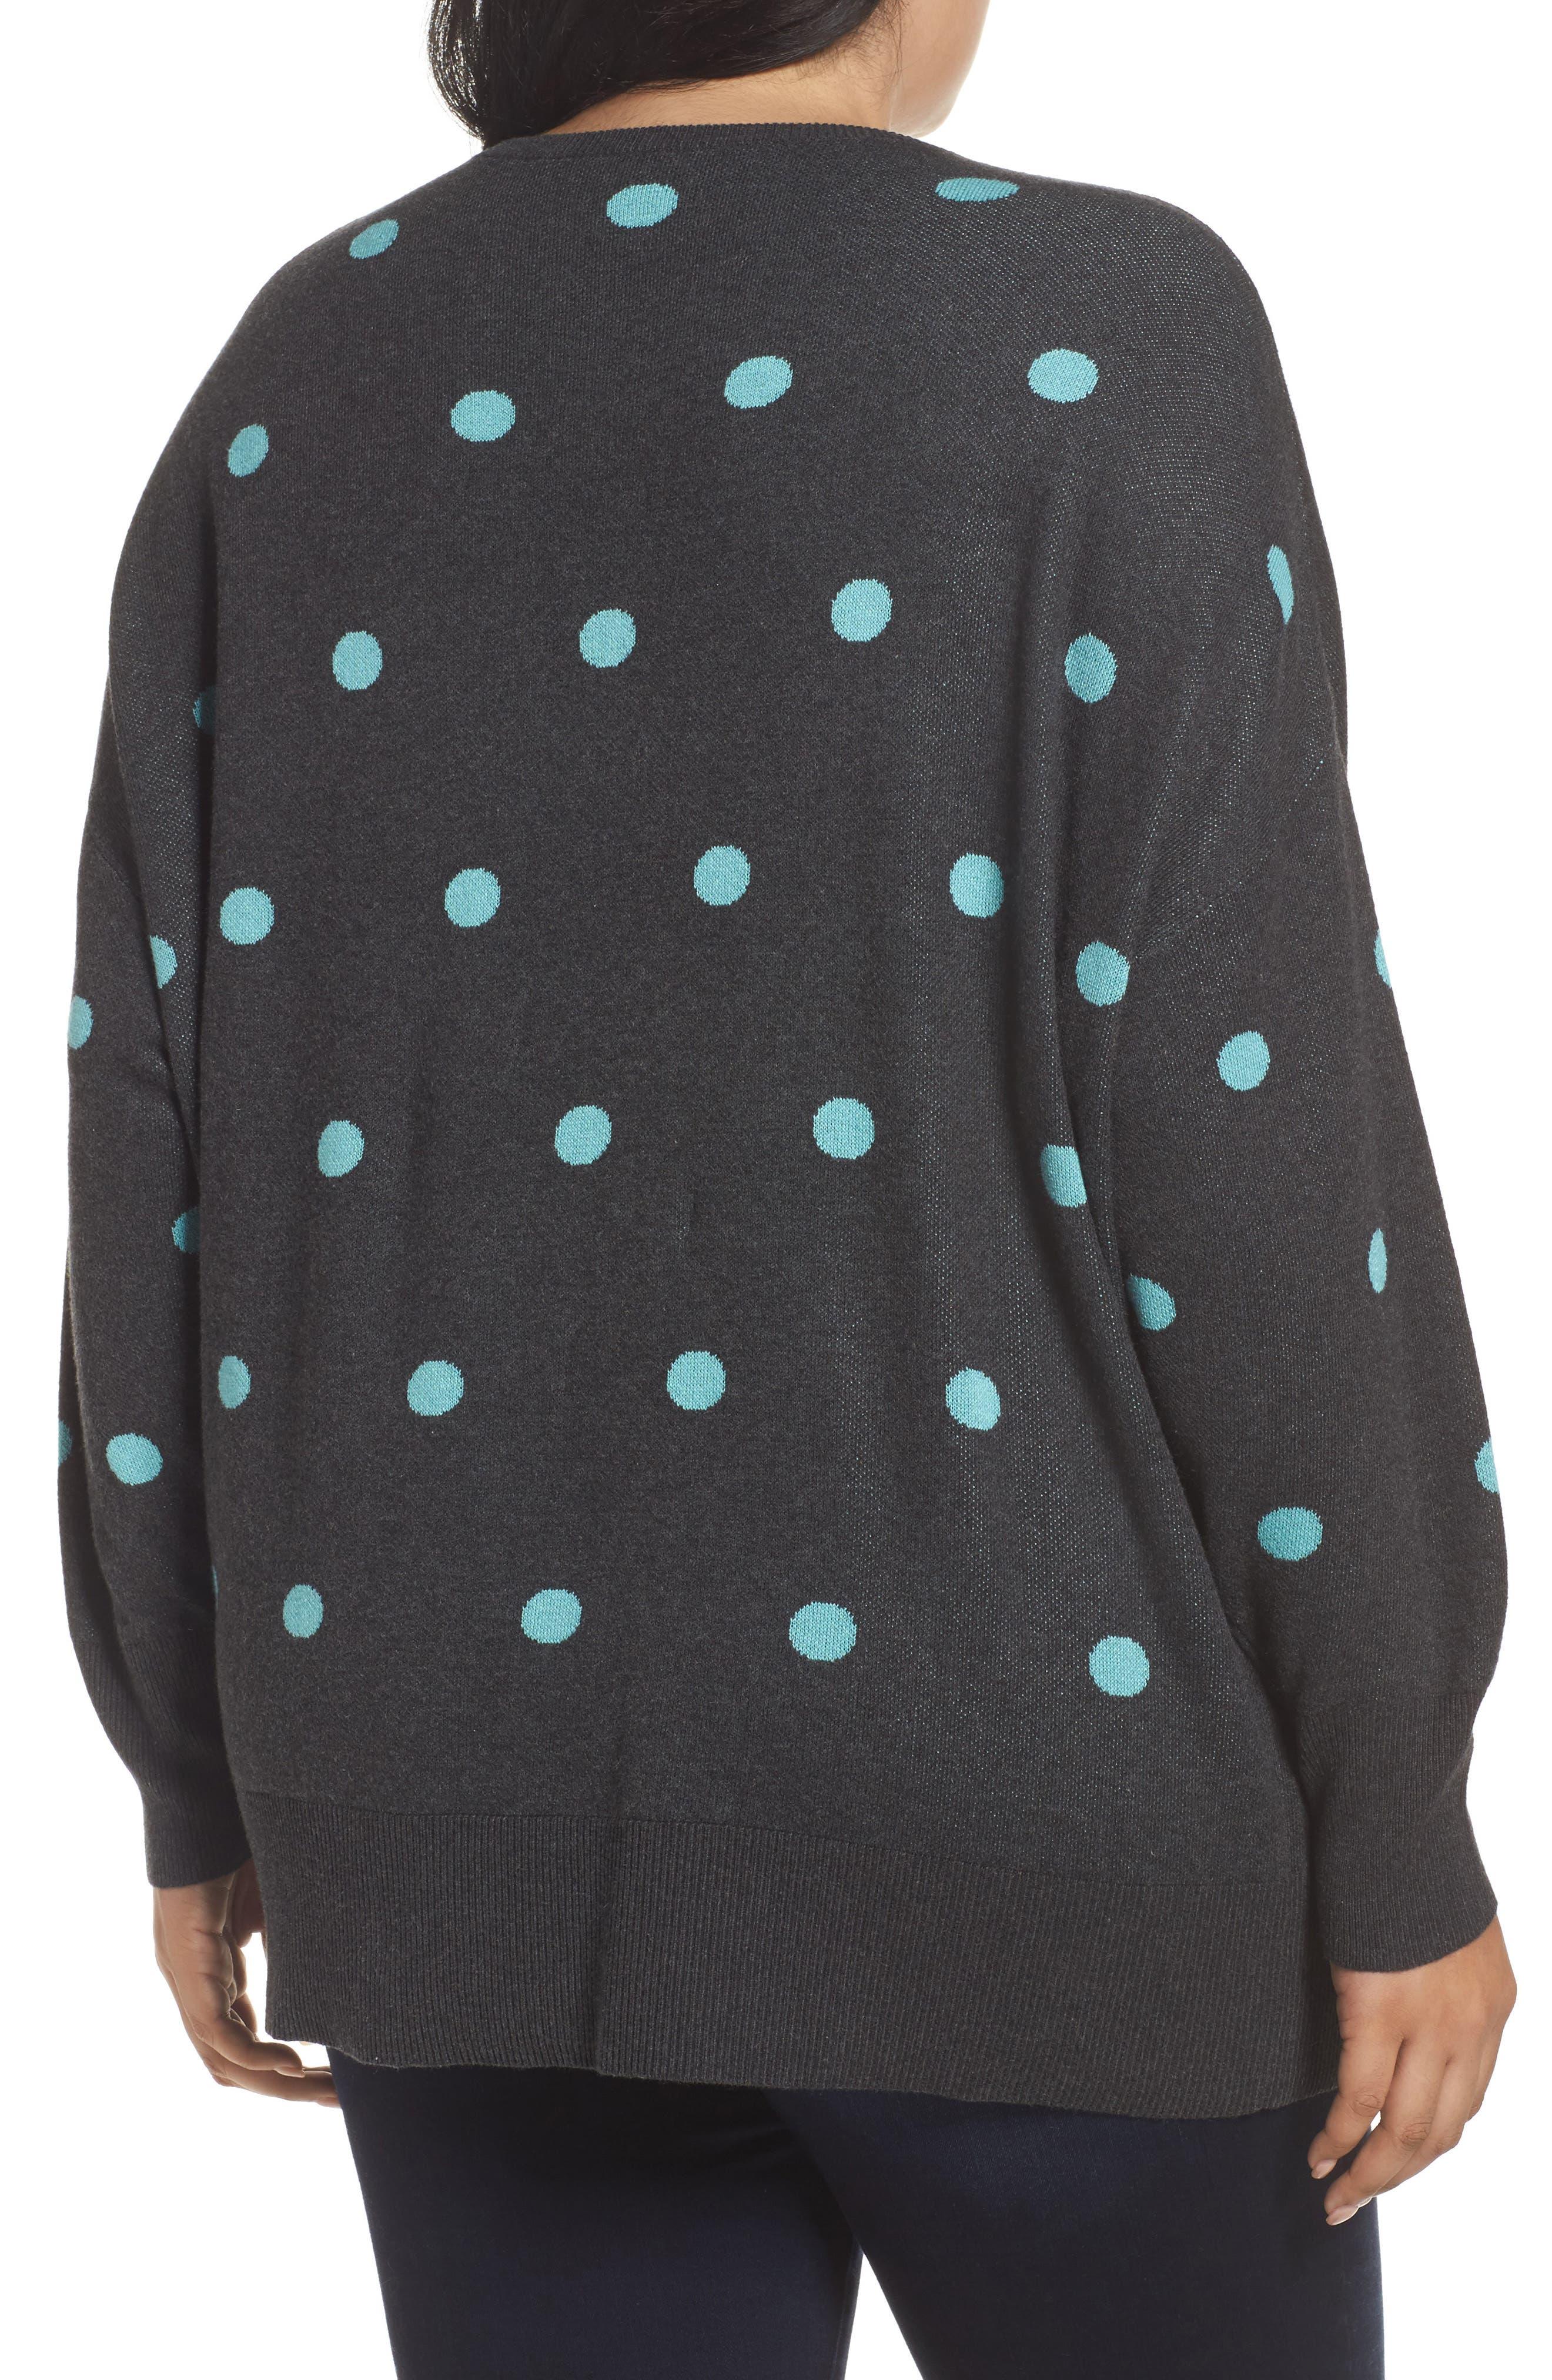 Dolman Sleeve Crewneck Sweater,                             Alternate thumbnail 2, color,                             Grey- Blue Dots Pattern